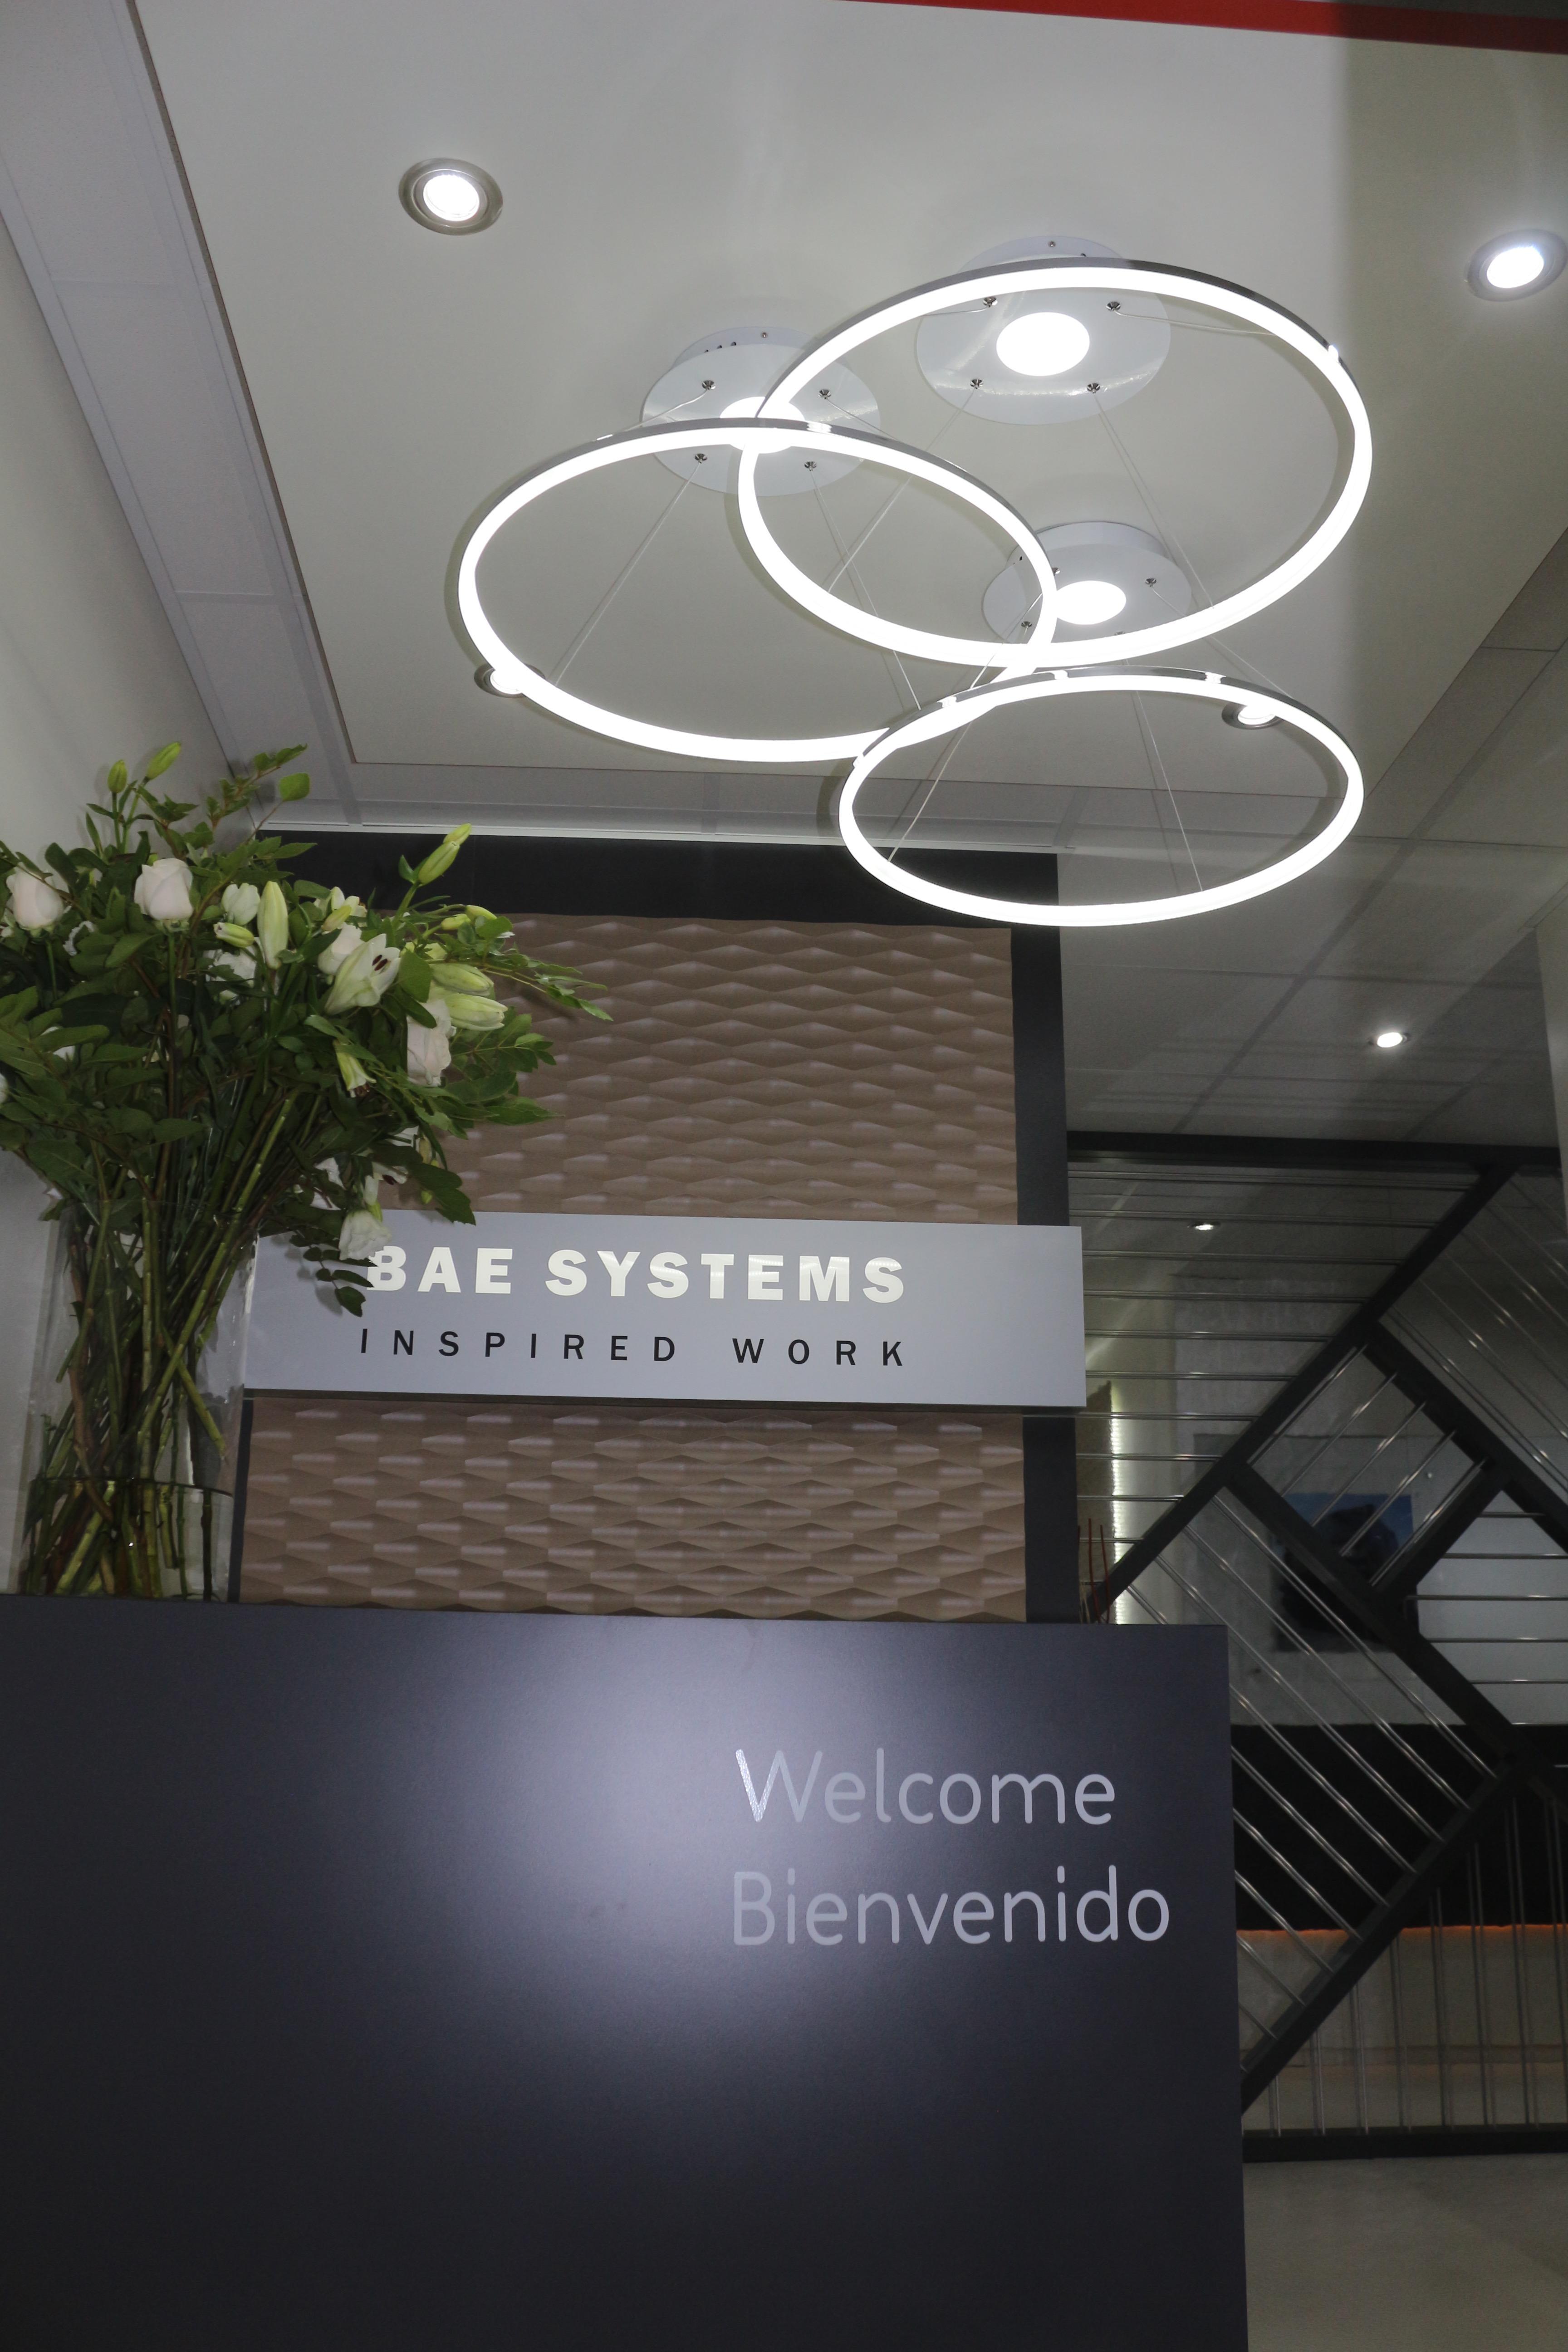 BAE SYSTEMS, Fidae16, Santiago, CL